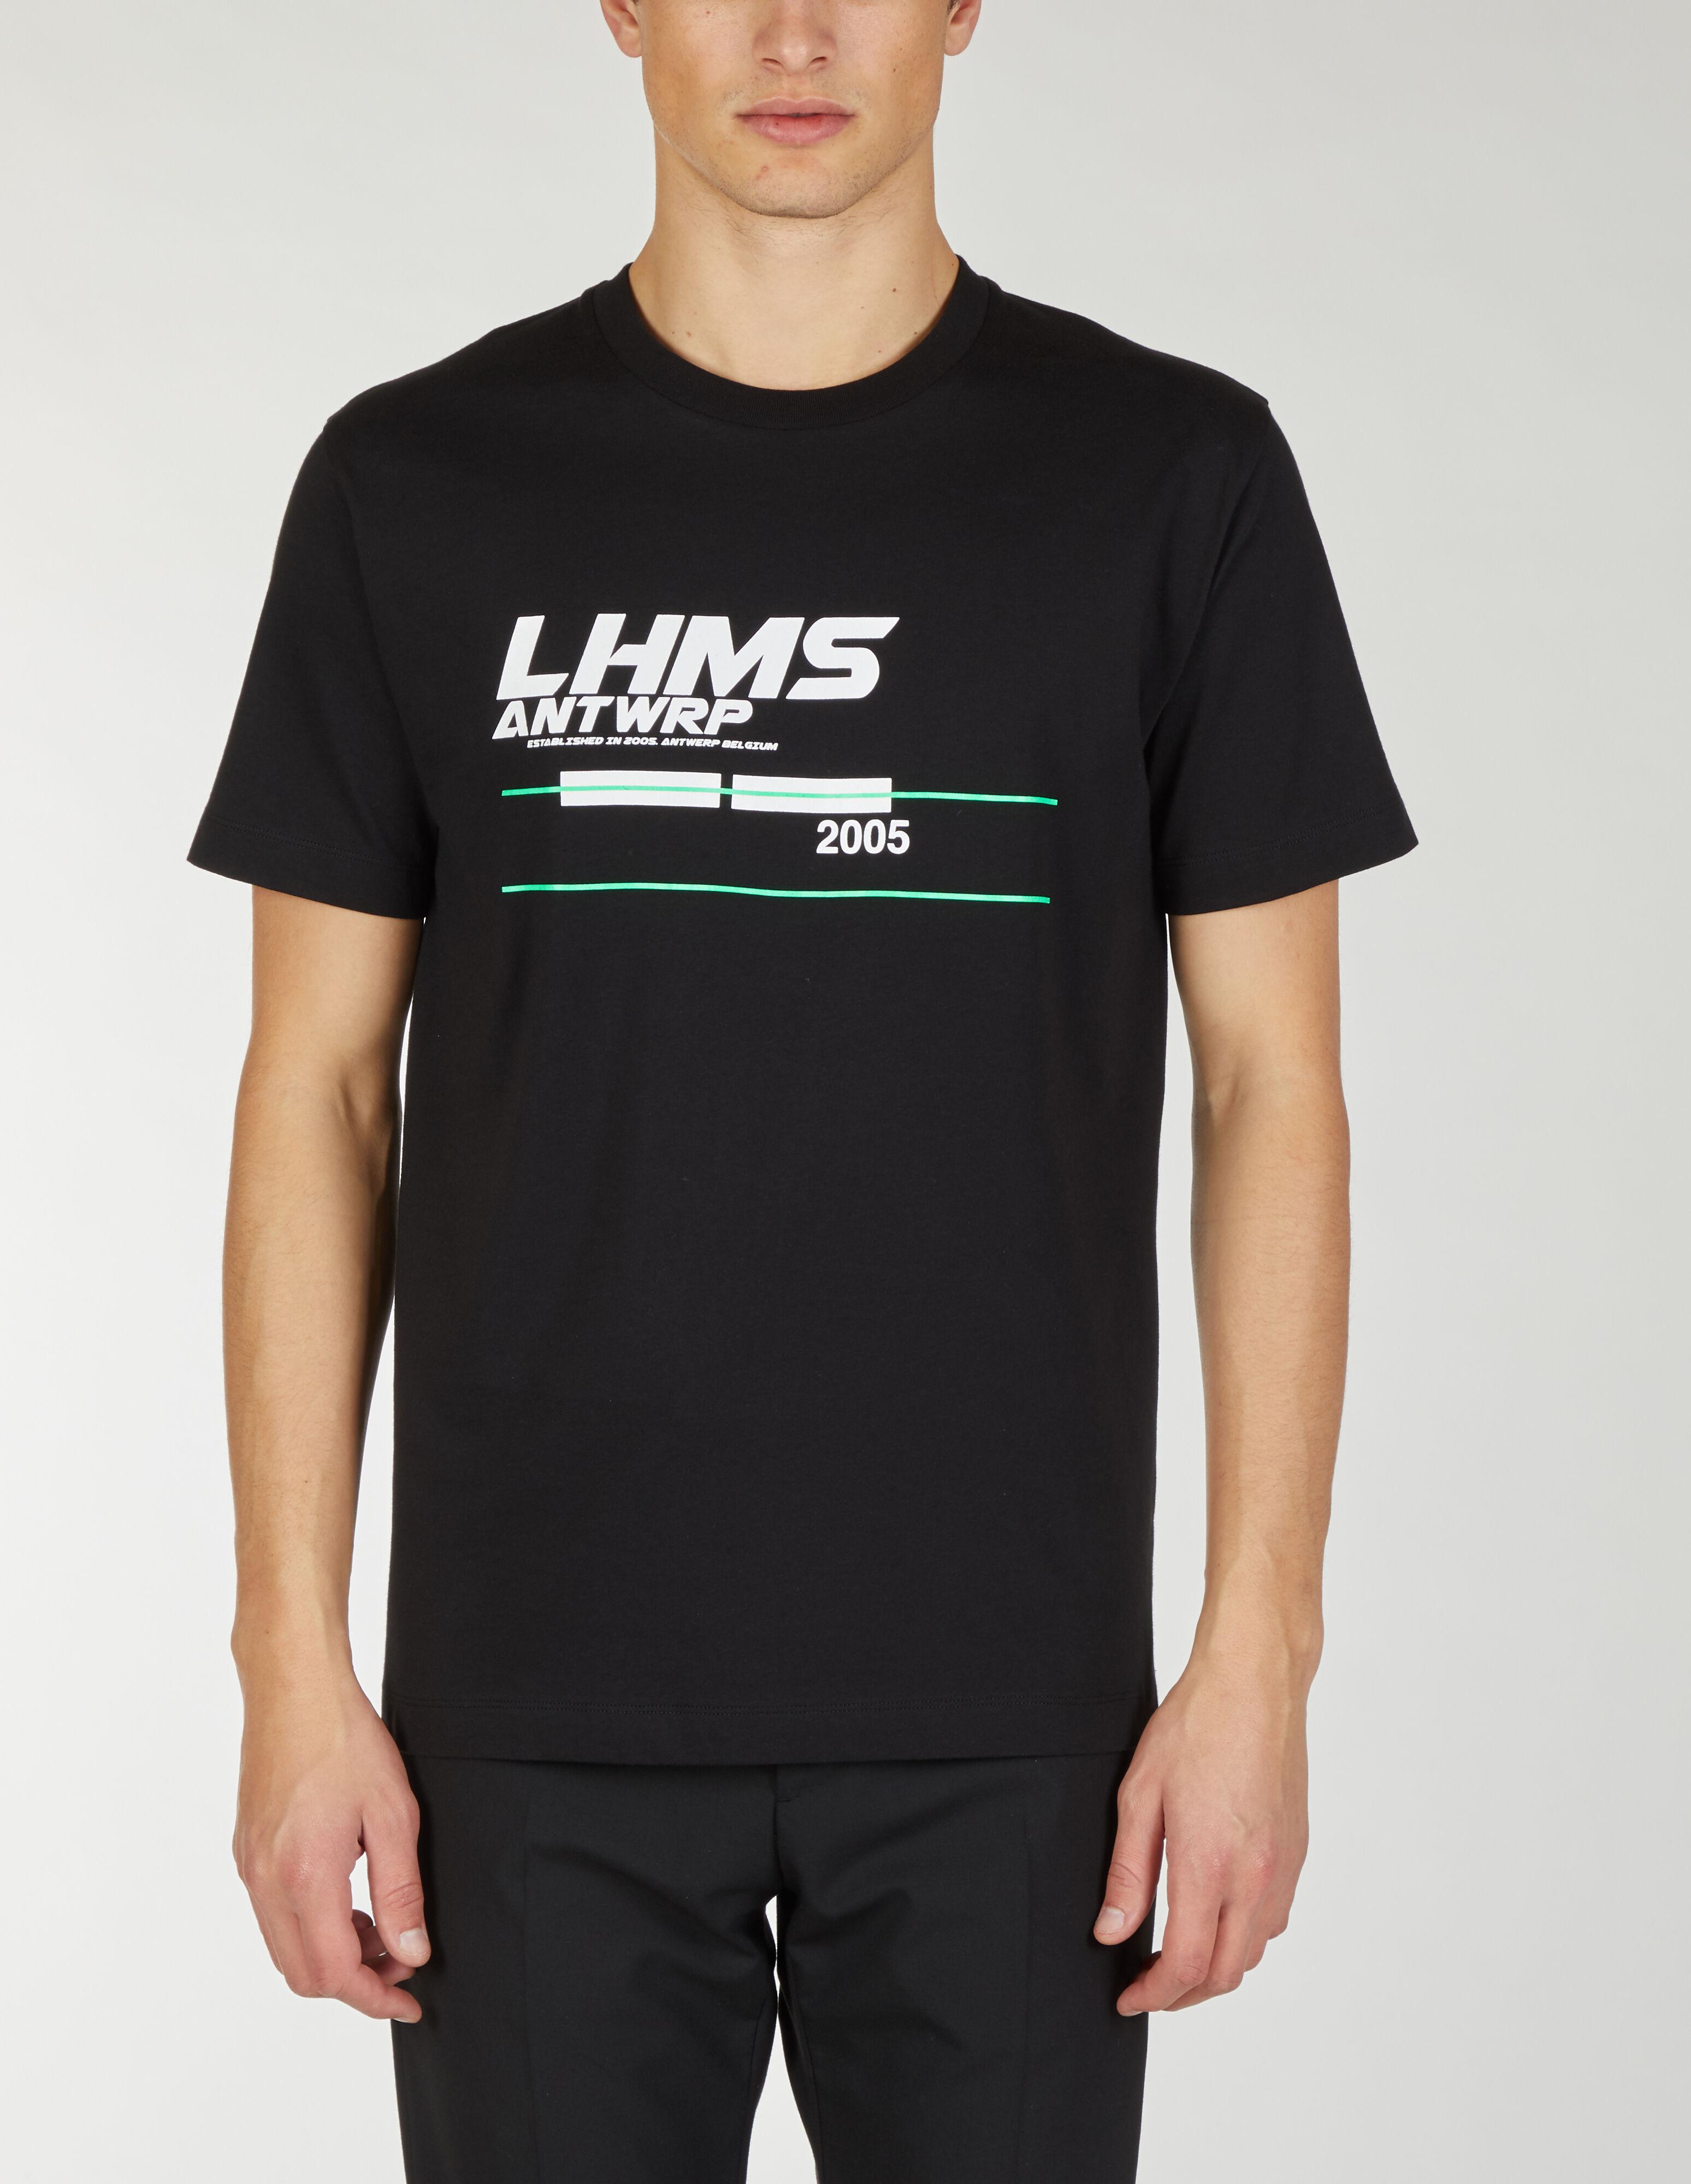 T-Shirt Antwerp 2005 - Les Hommes